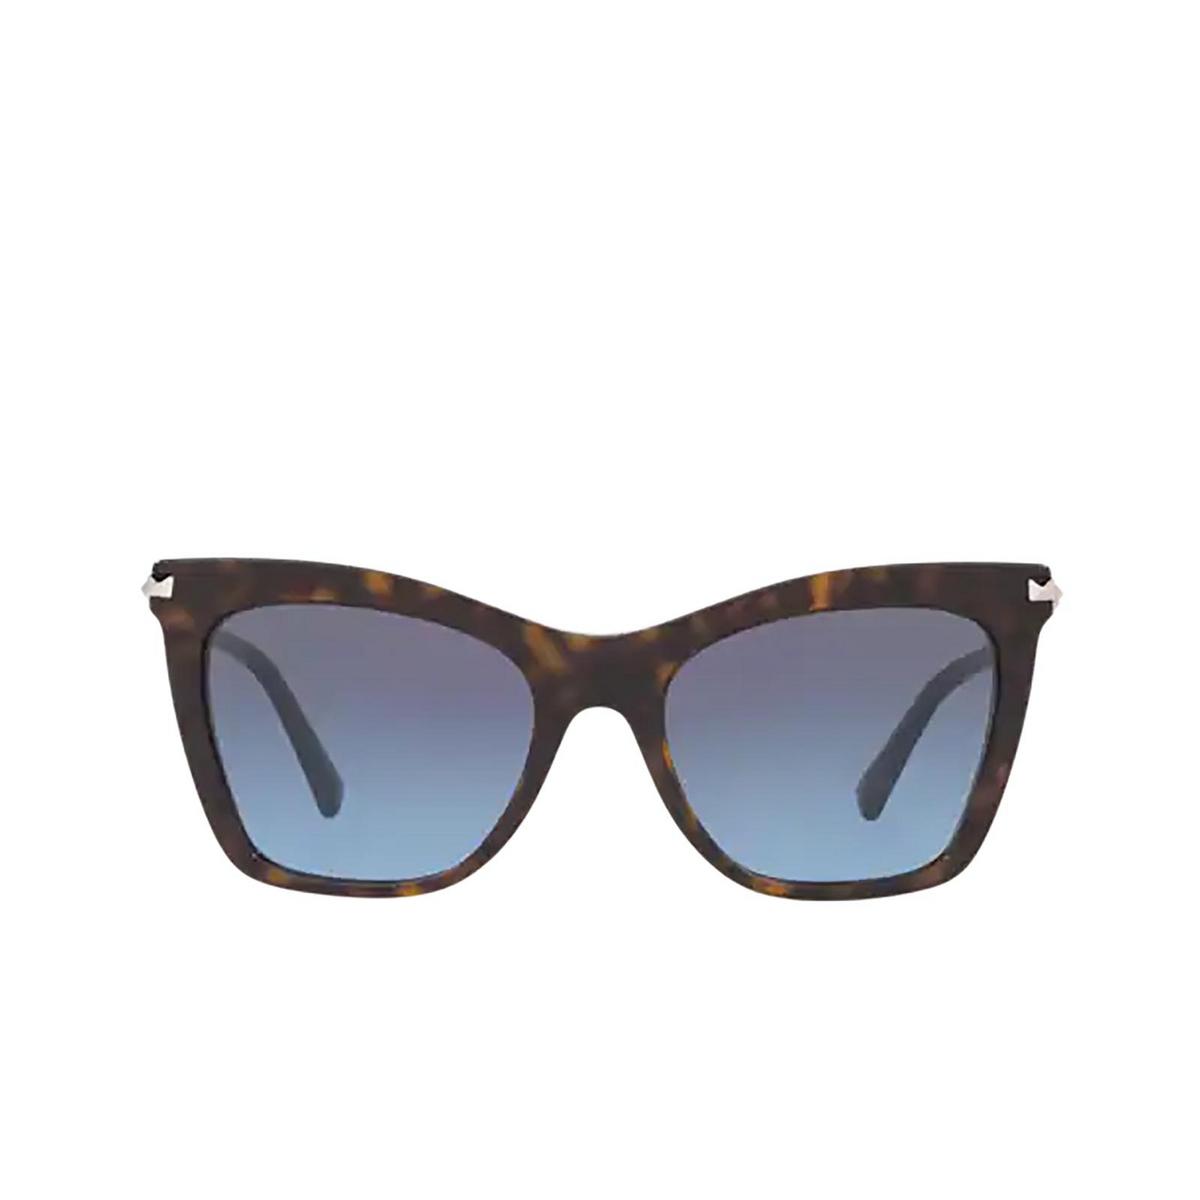 Valentino® Cat-eye Sunglasses: VA4061 color Havana 50028F - front view.